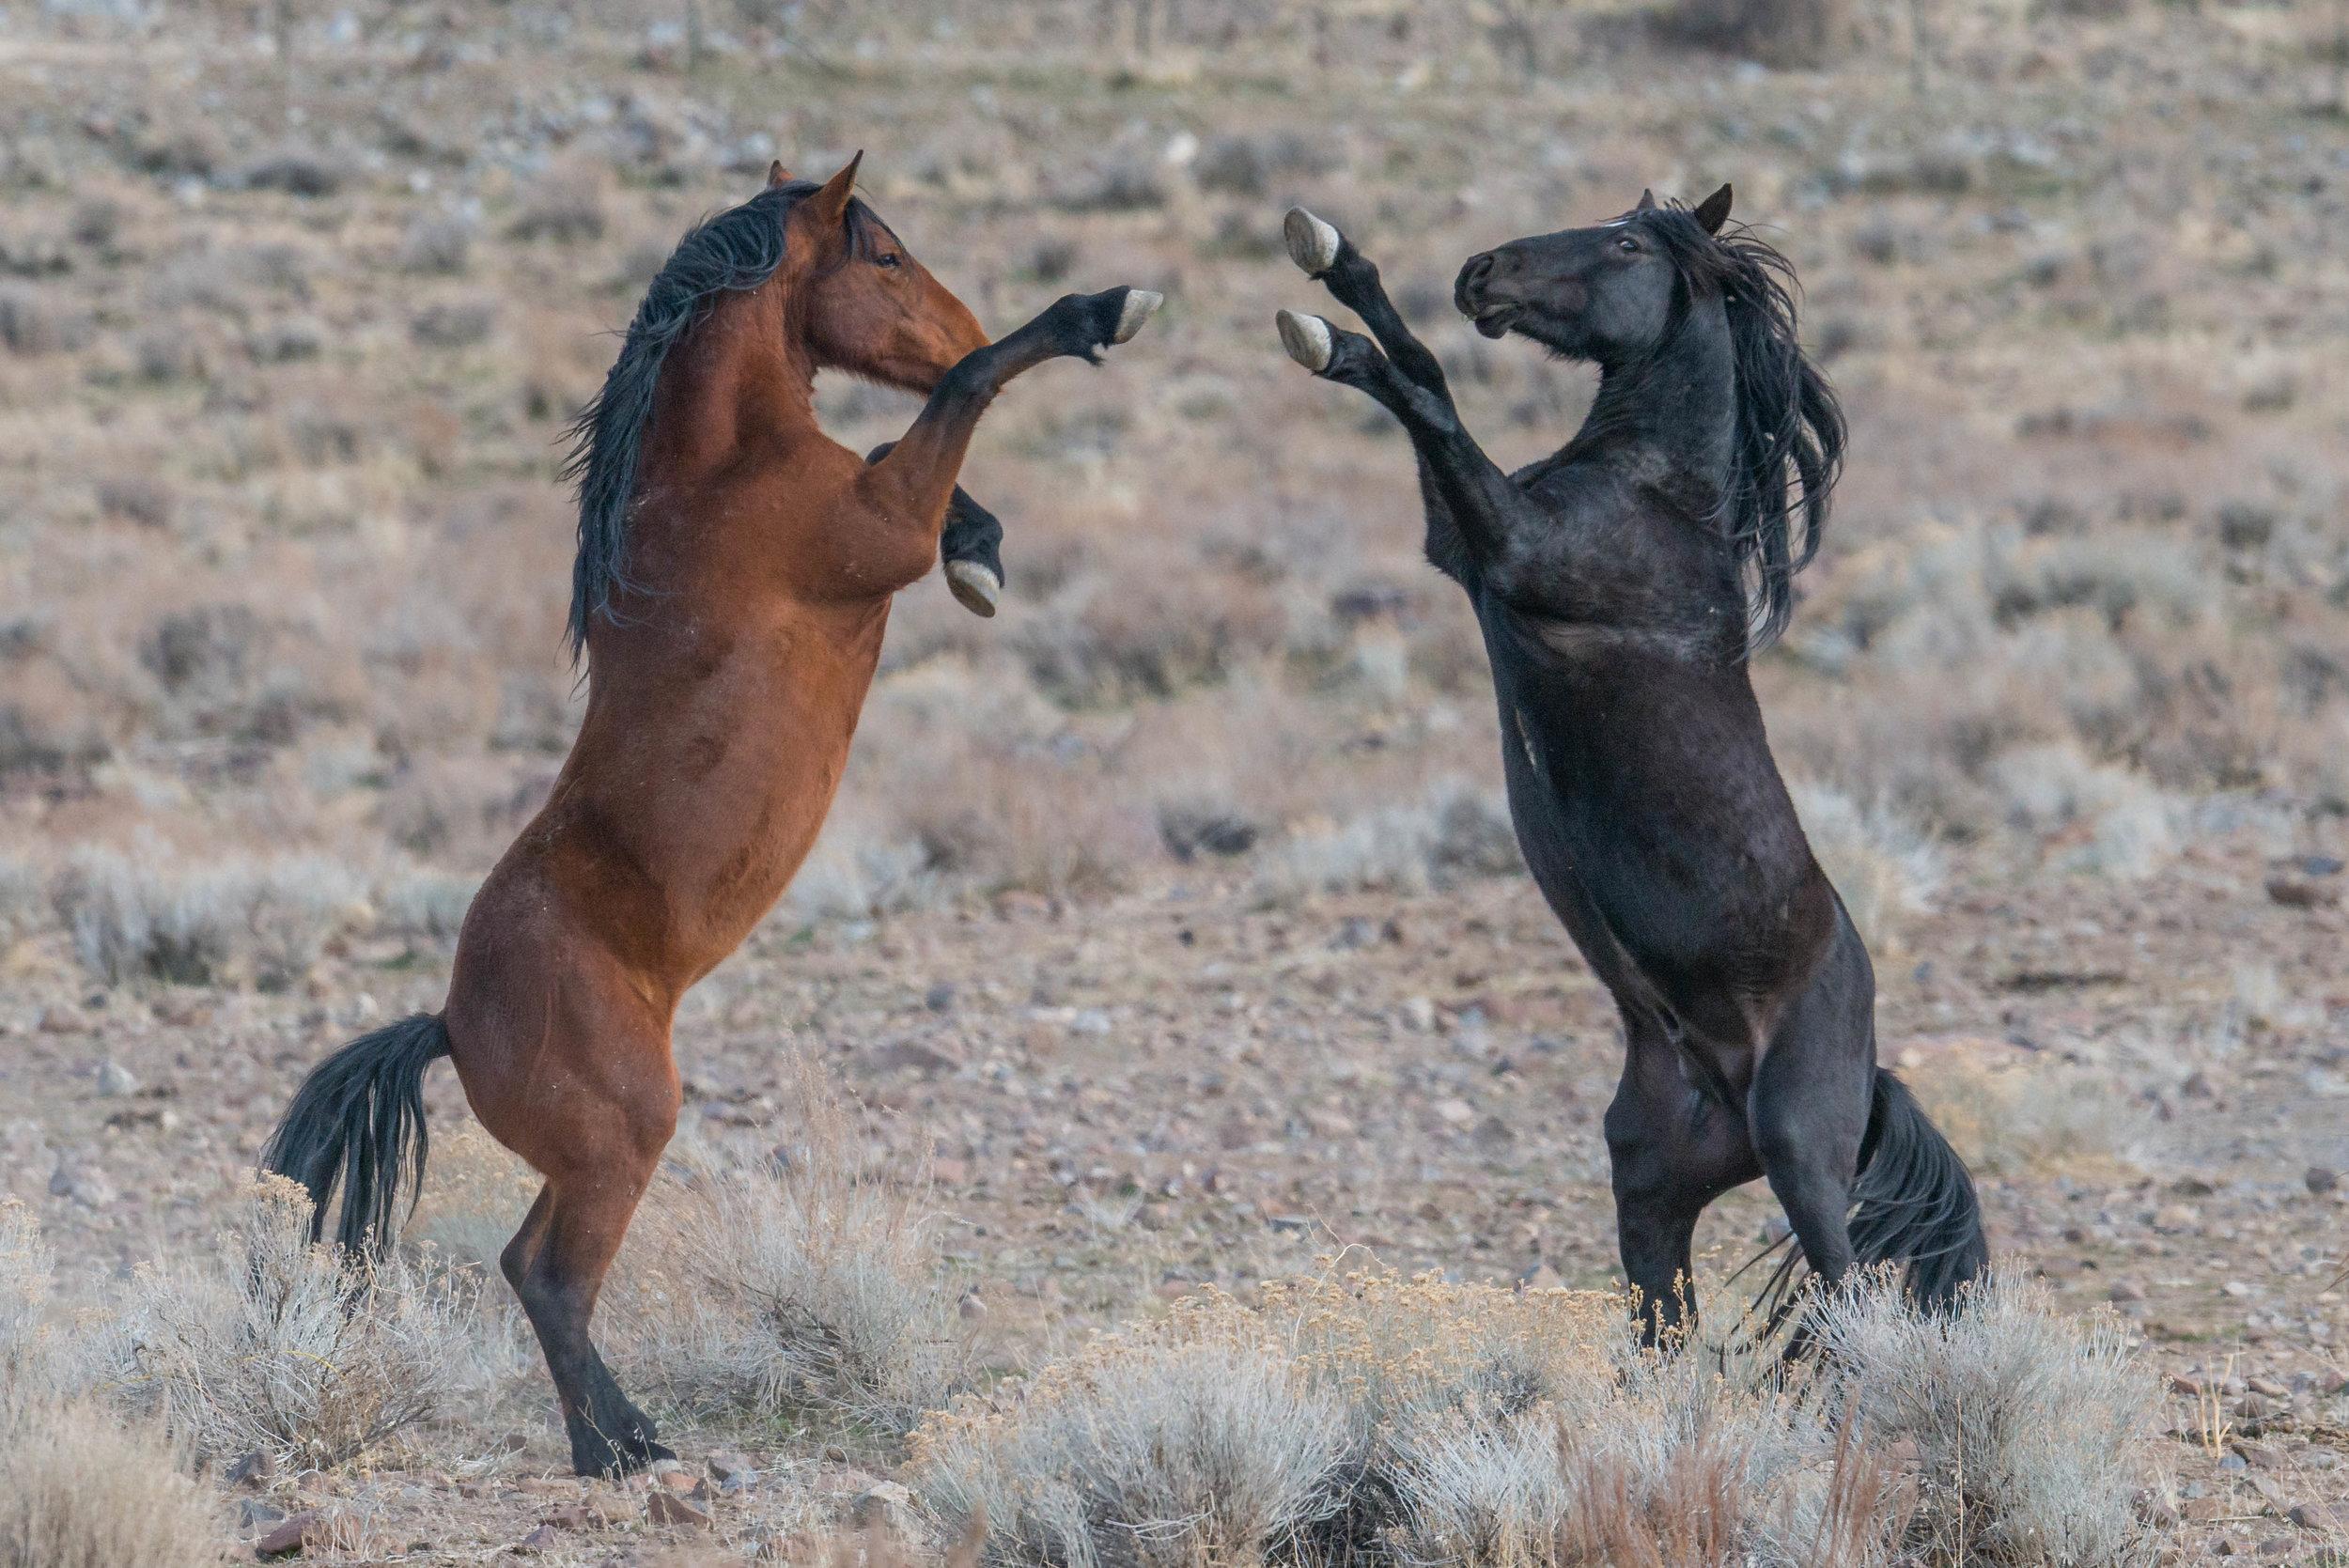 Mustang (Equus ferus) - Hidden Valley, WAS (NV) Jan-2018